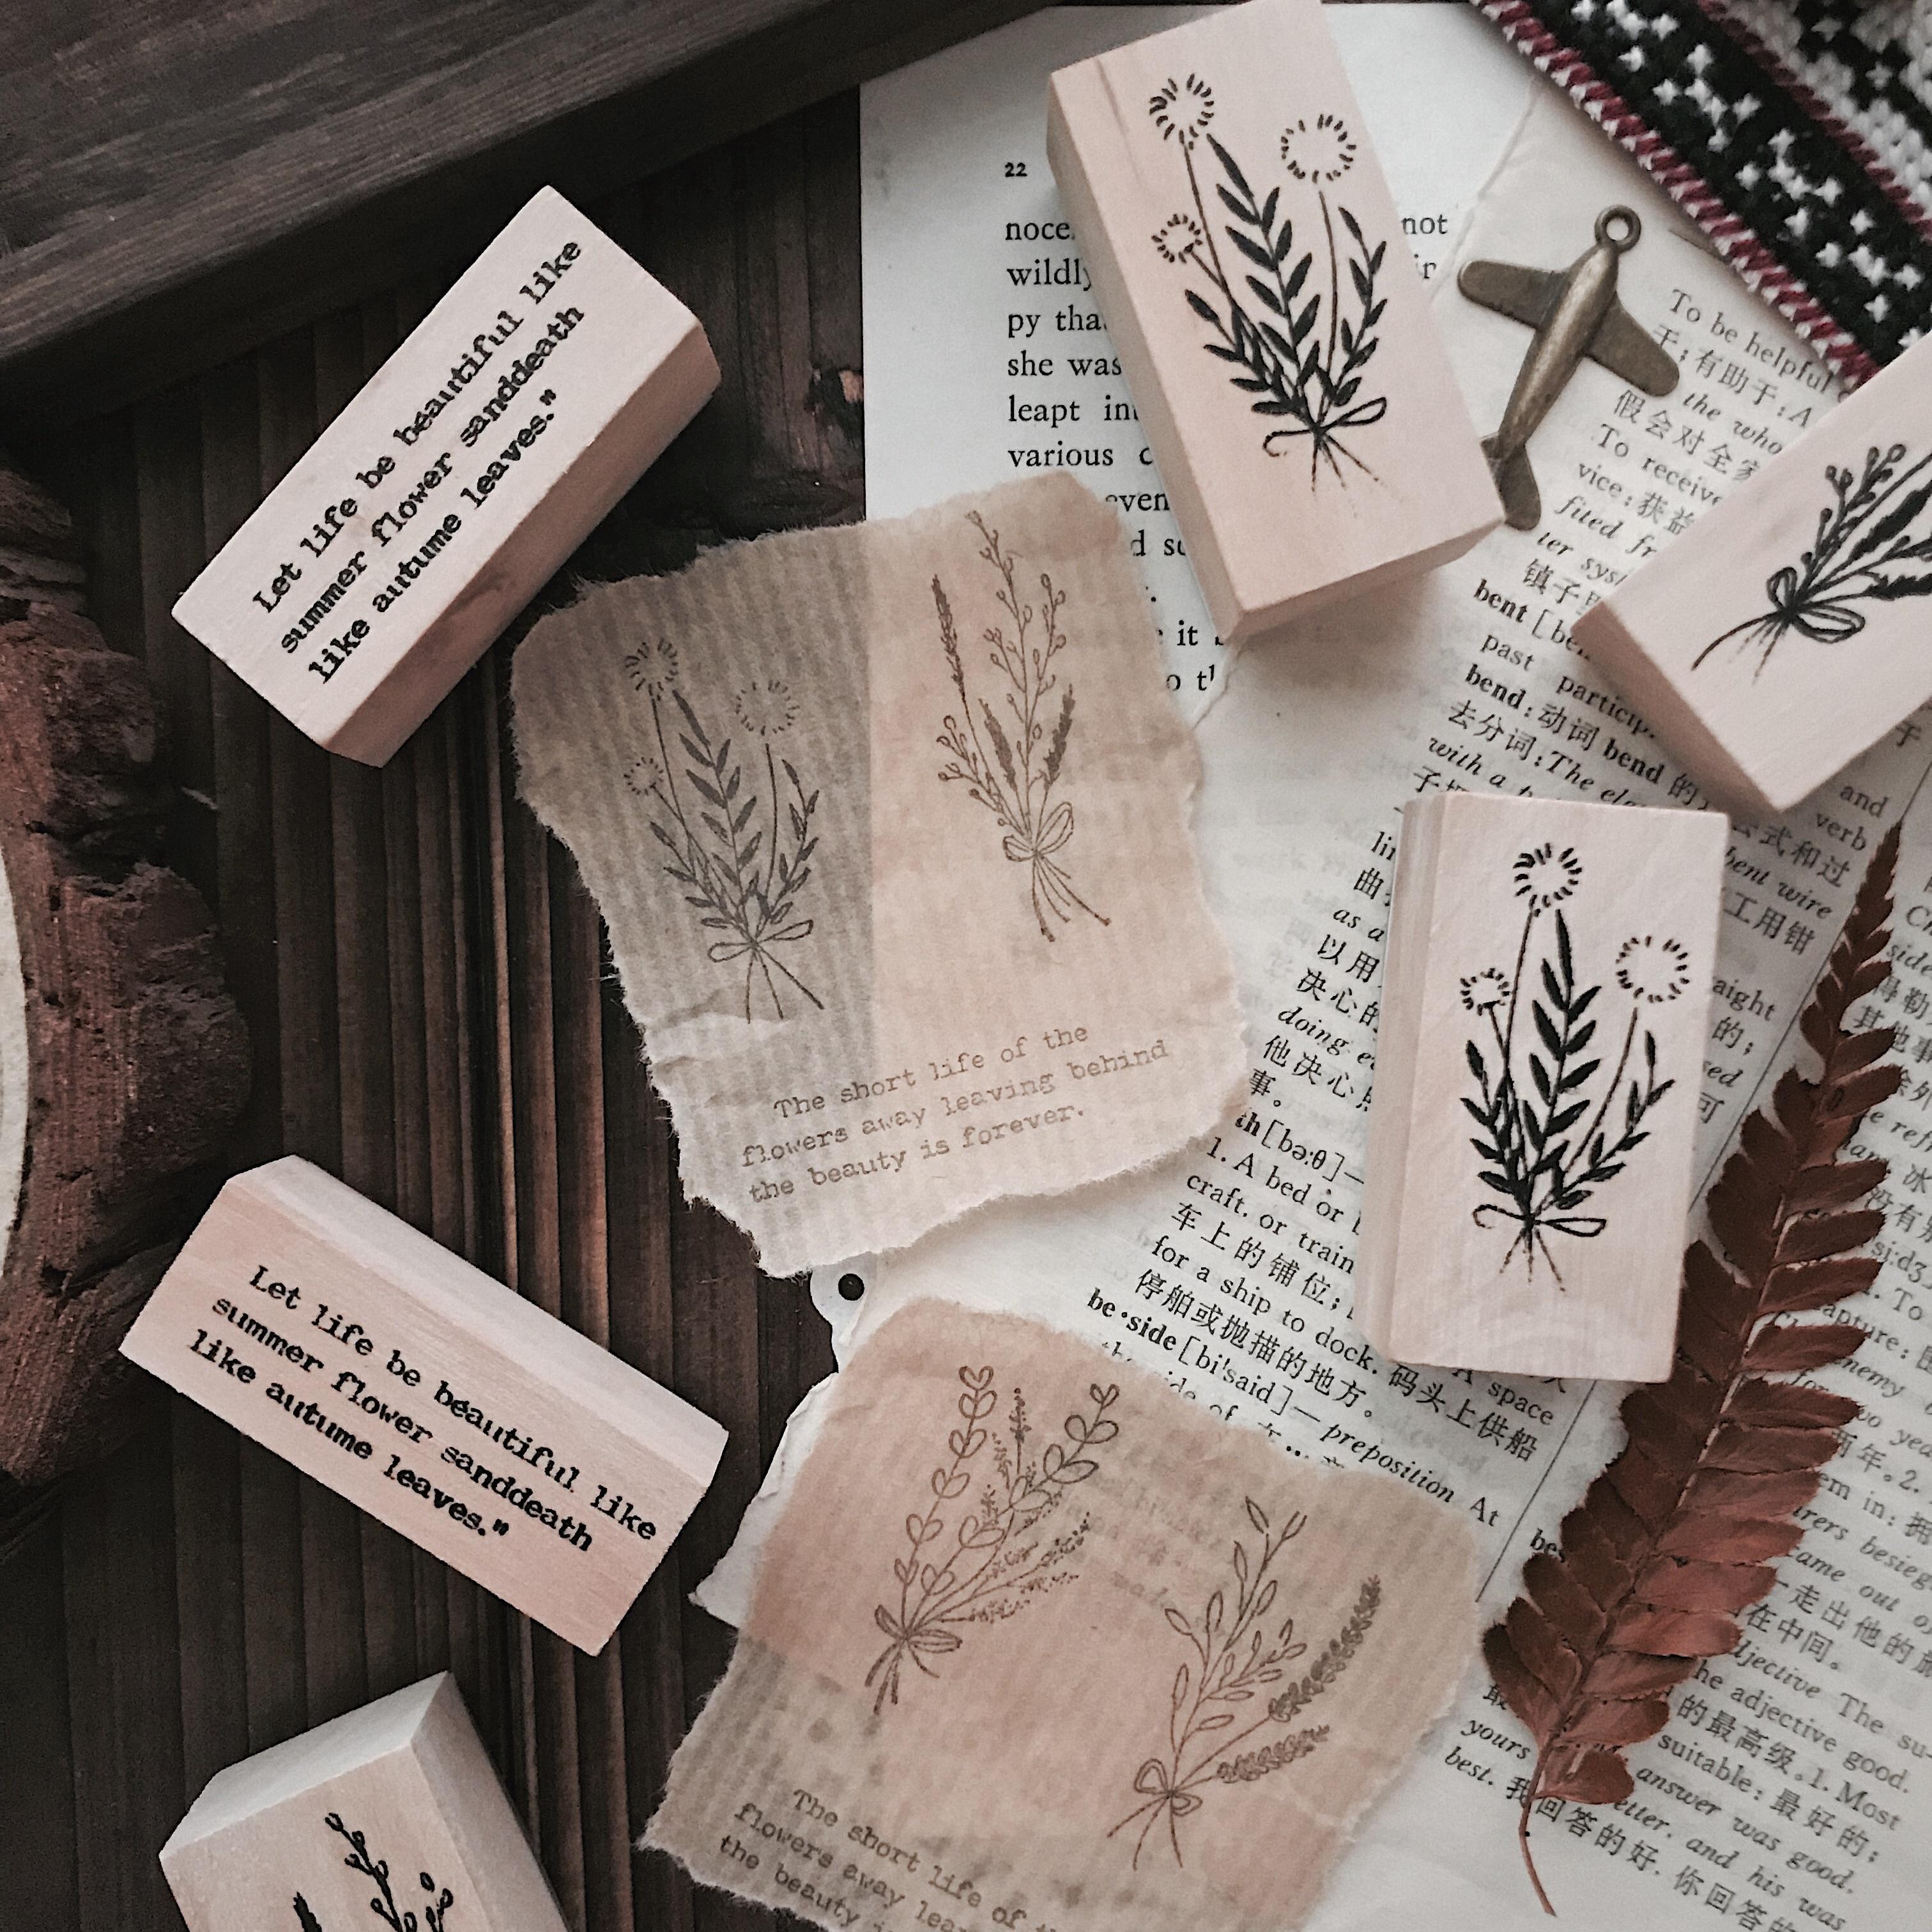 3Pcs/Bag Vintage Leaves Series Wooden Rubber Stamps For Scrapbooking Stationery DIY Scrapbooking Wooden Stamp